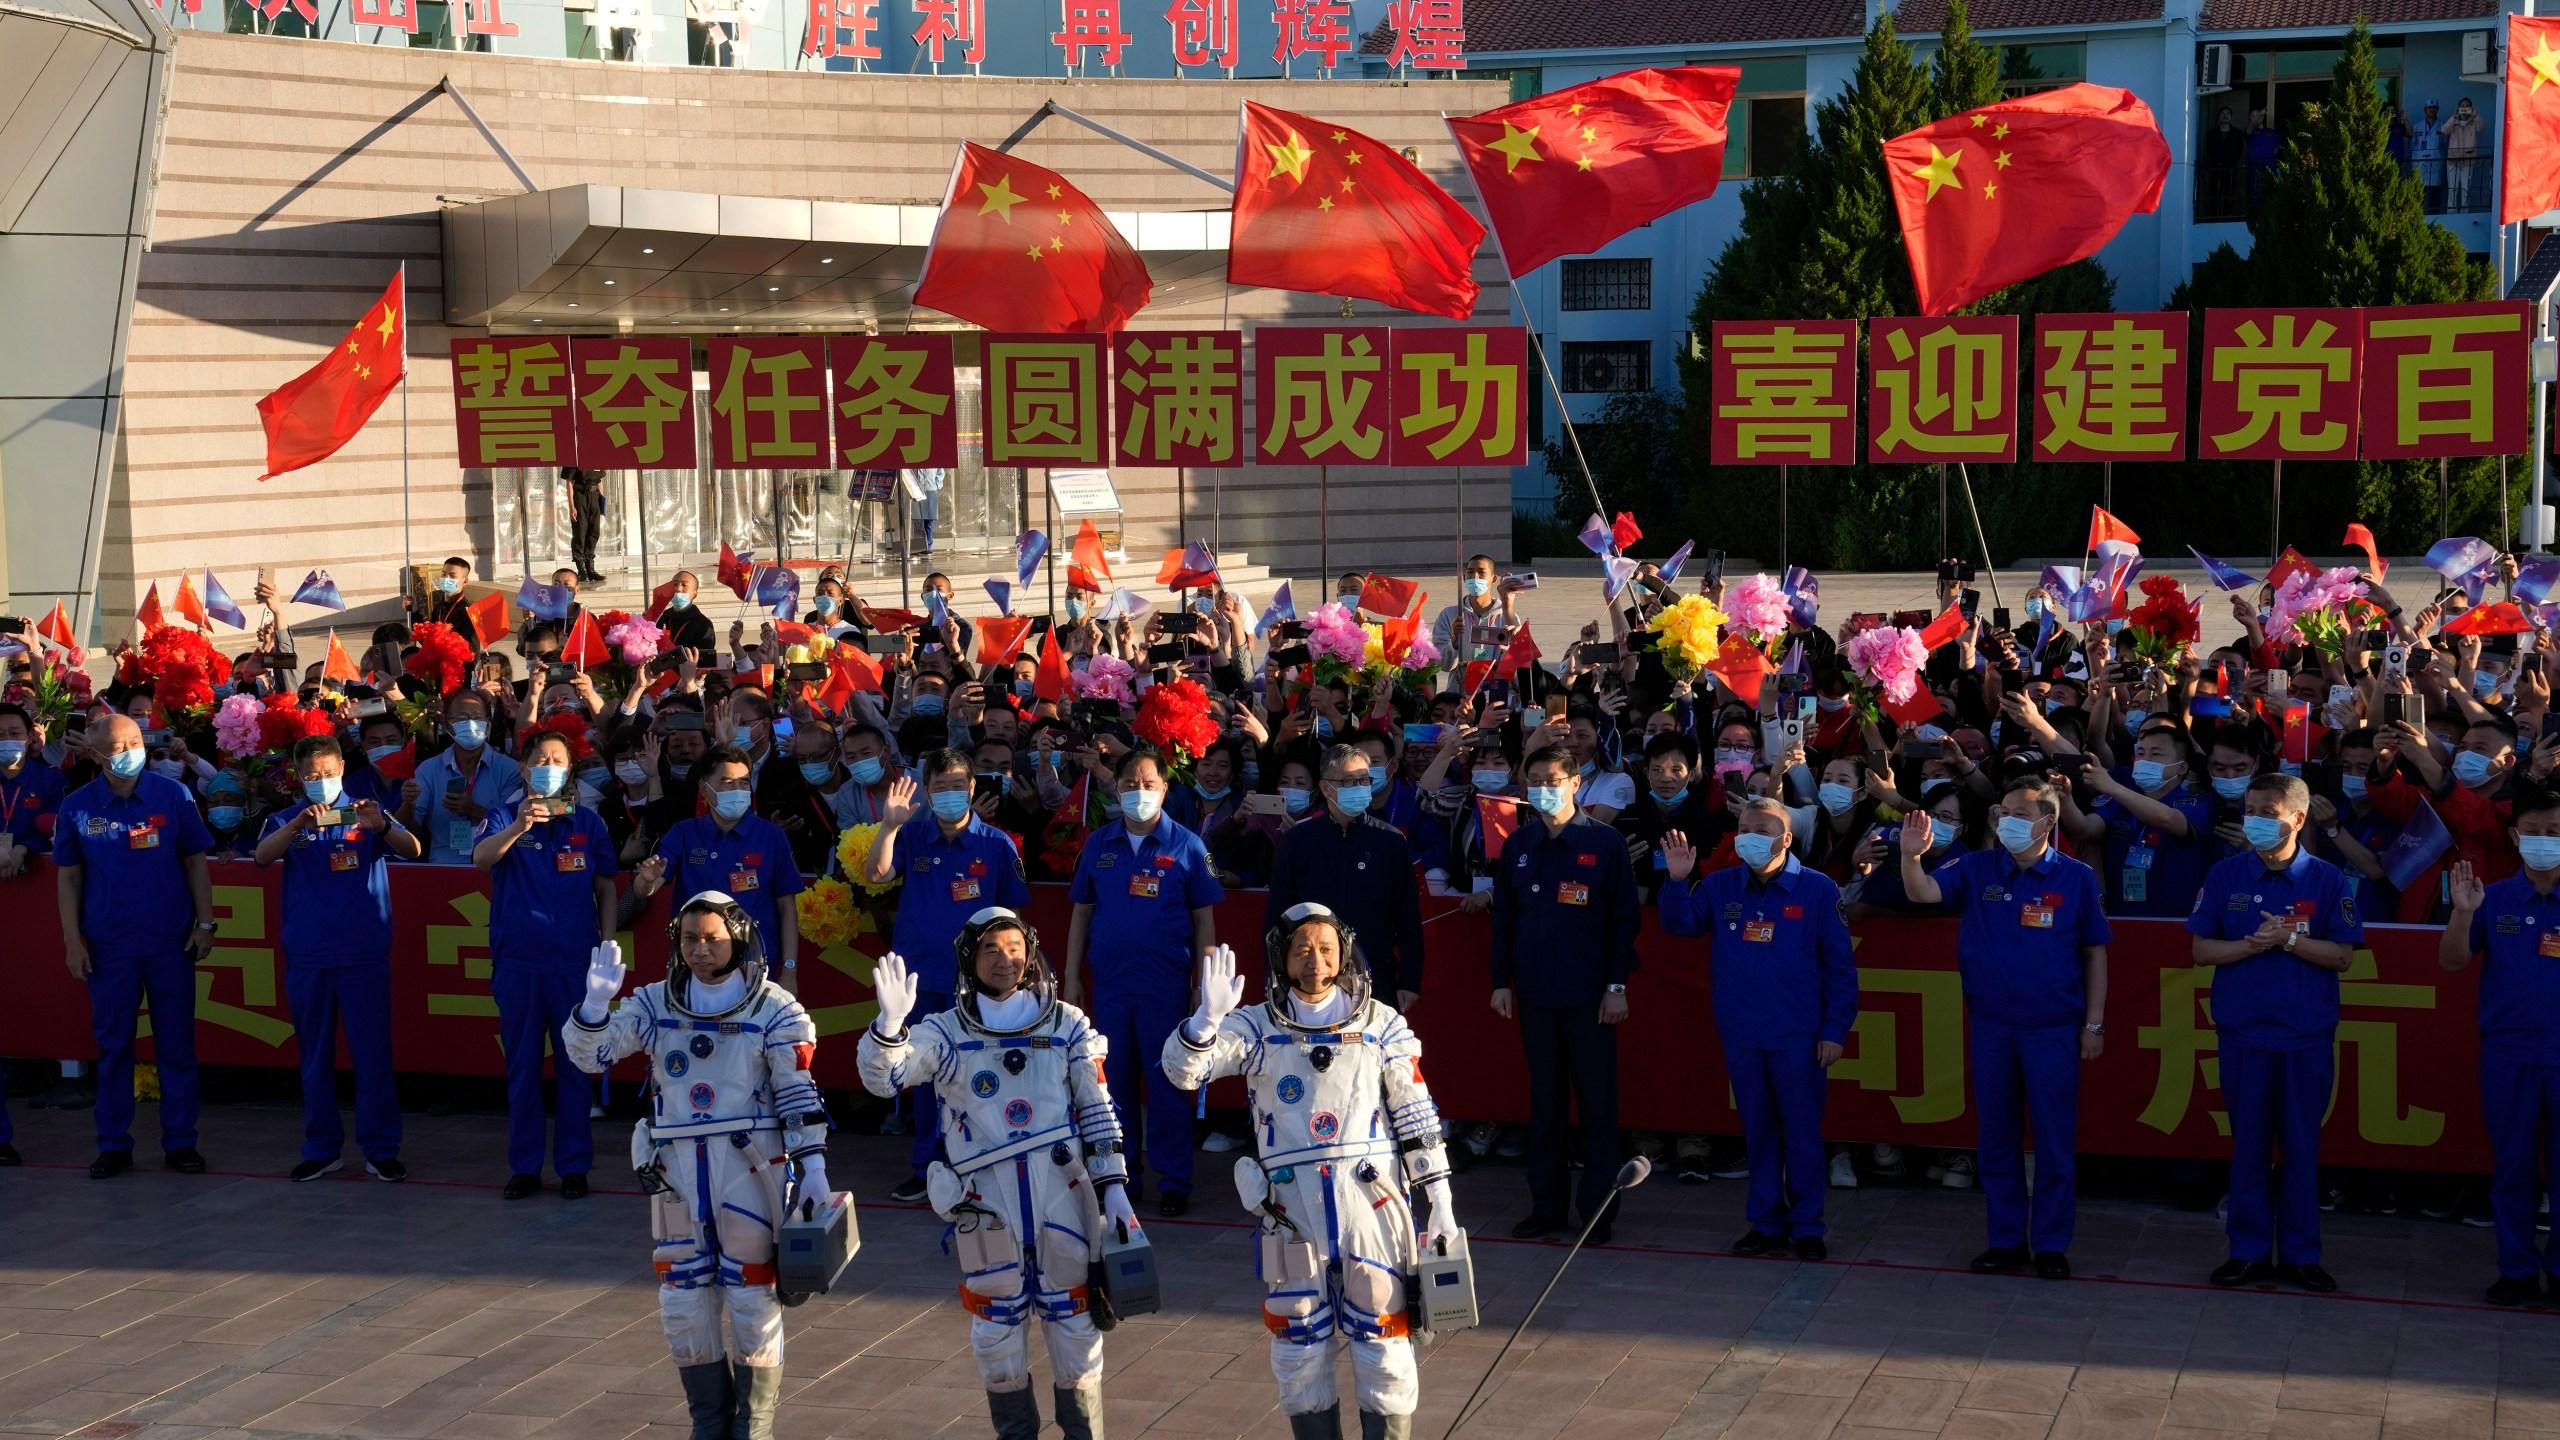 Tang Hongbo, Nie Haisheng, Liu Boming